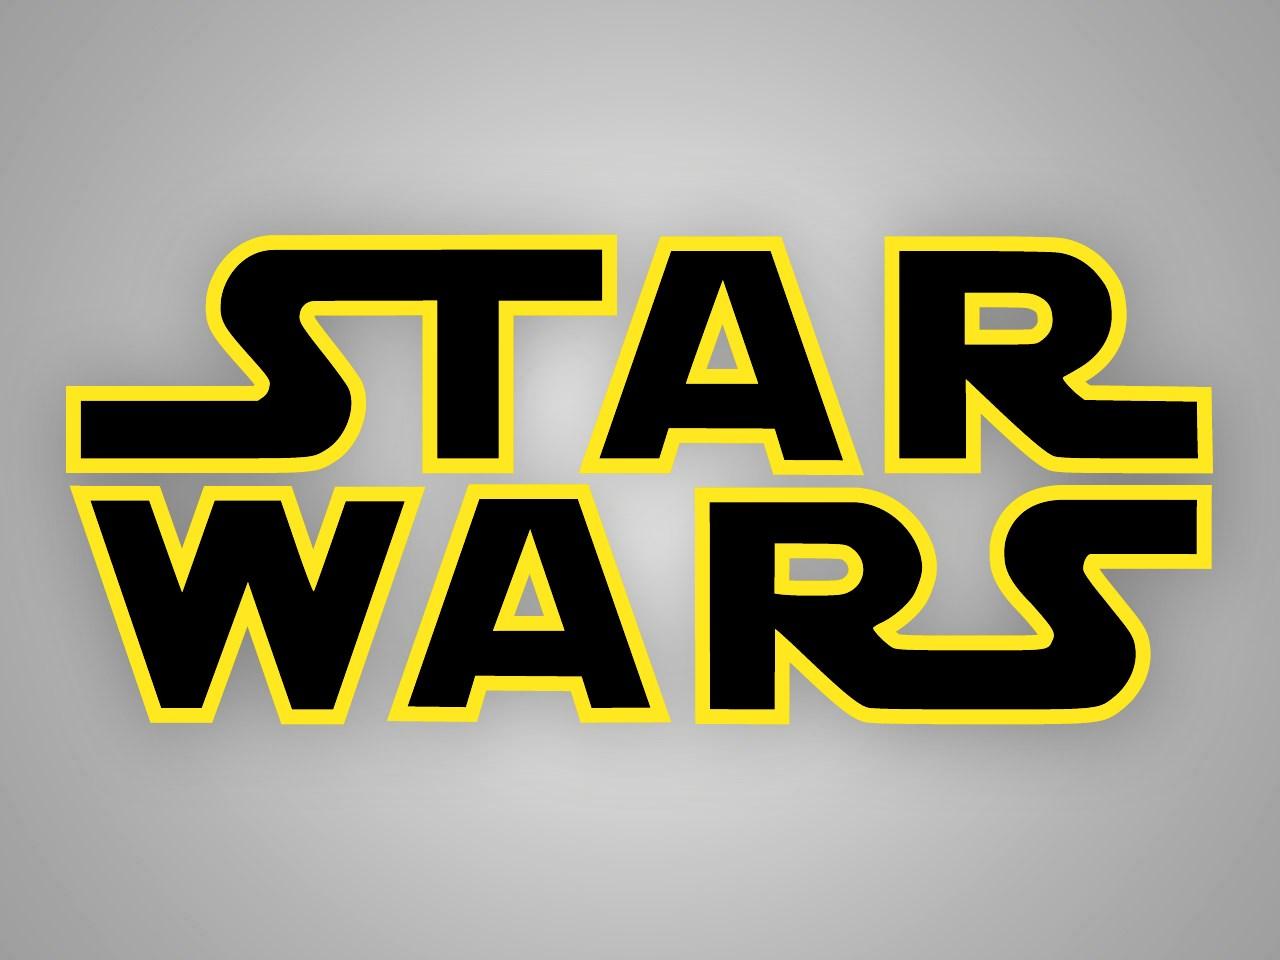 STAR WARS_1510274587990.jpg